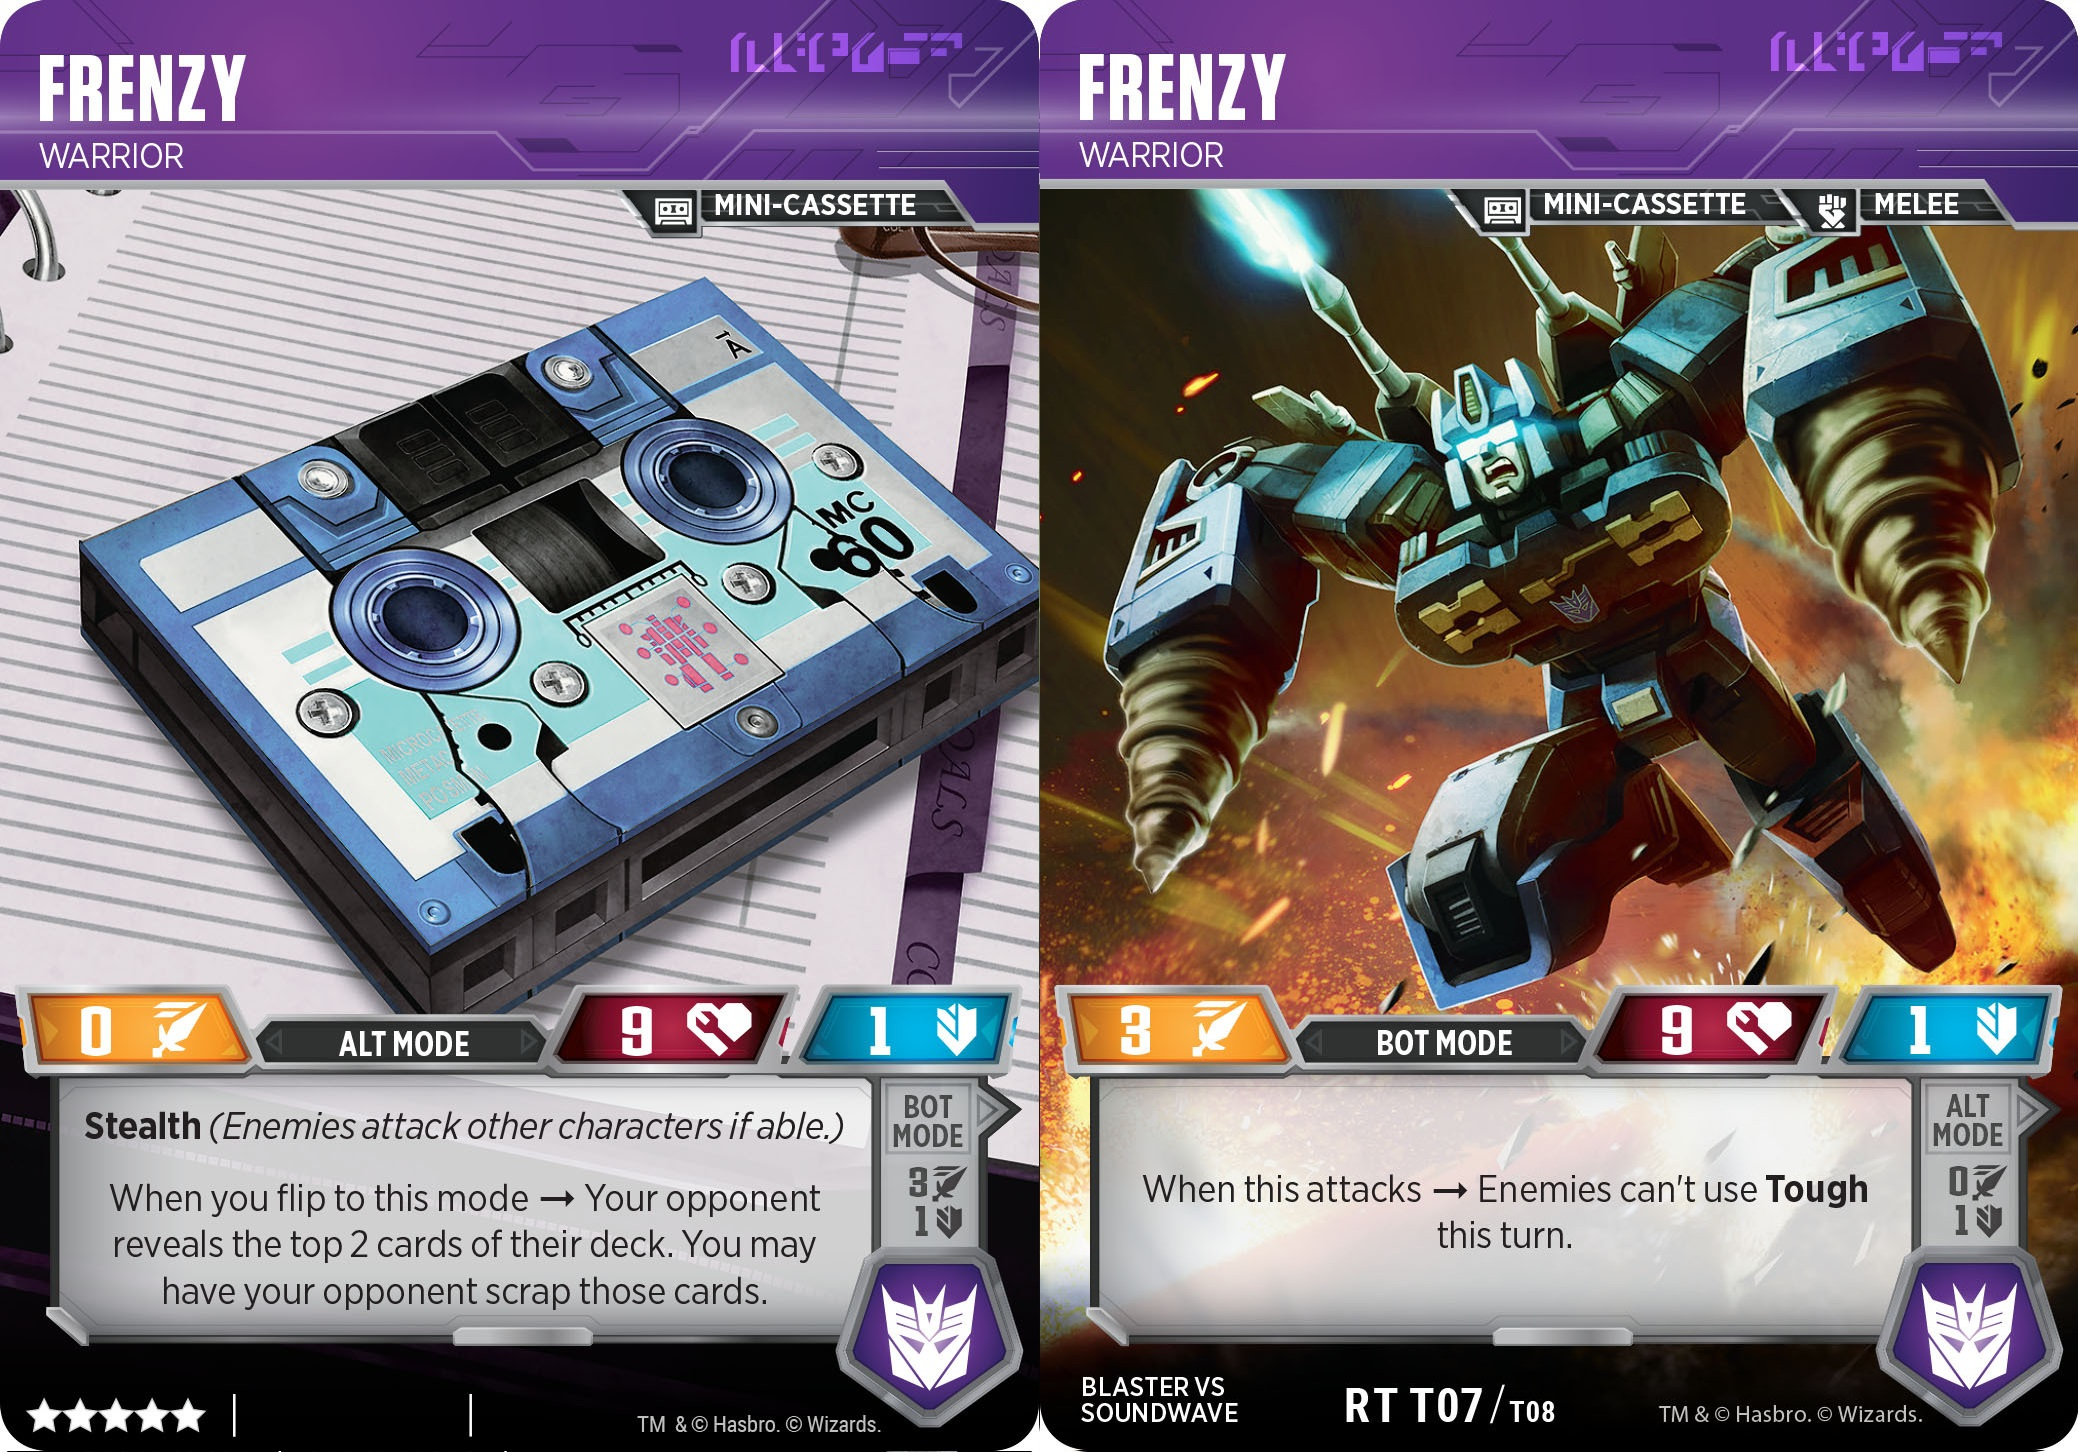 Frenzy // Warrior